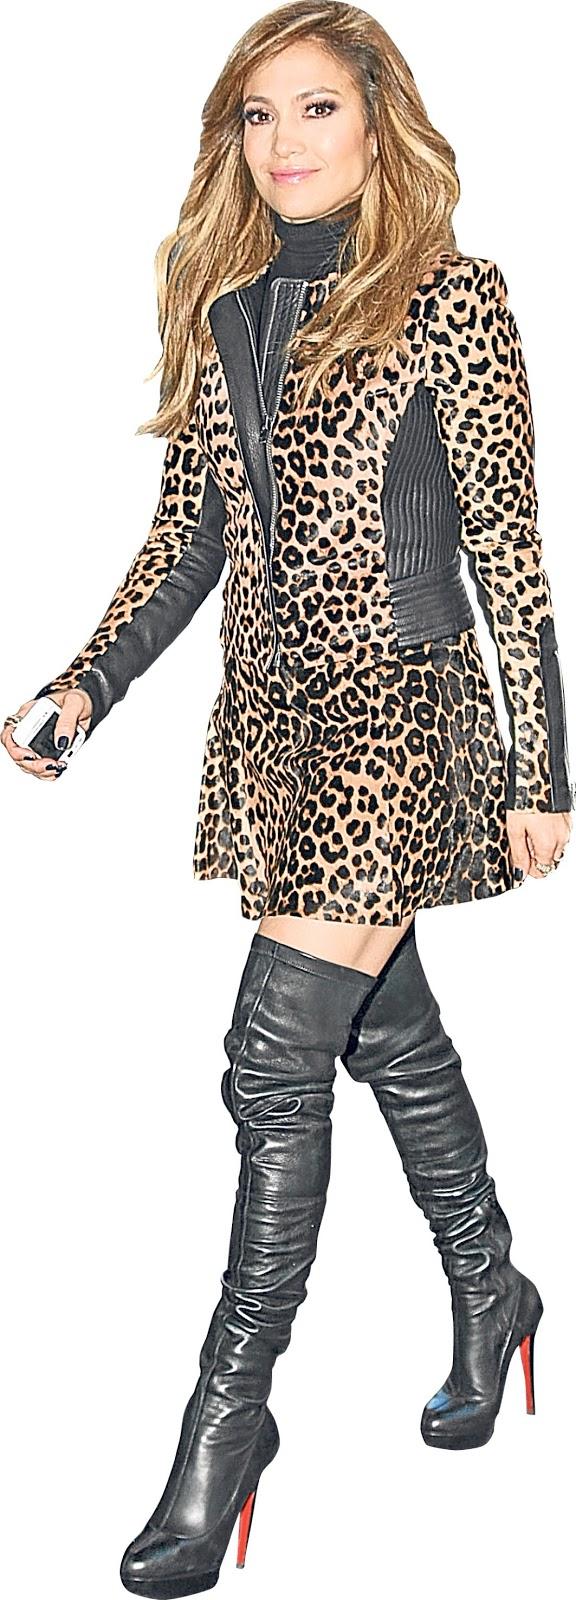 Selin Demiratar Biogra... Jennifer Lopez